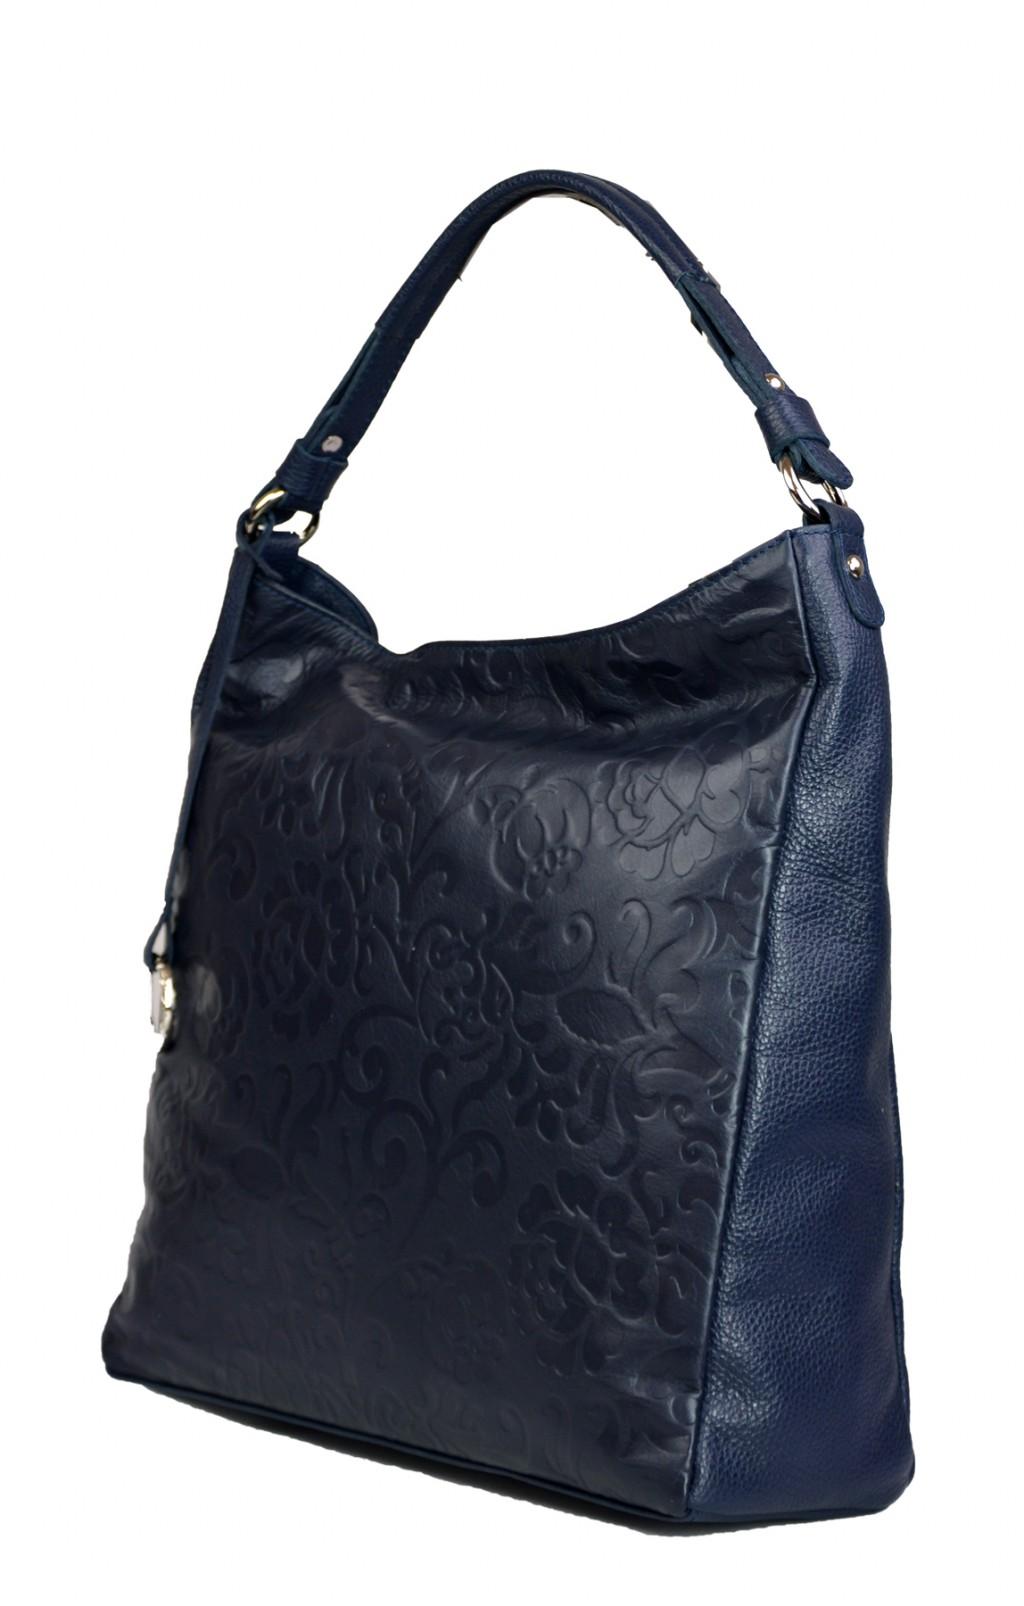 Dámská kožená kabelka FACEBAG  ELIA - Modrá se vzorem květin